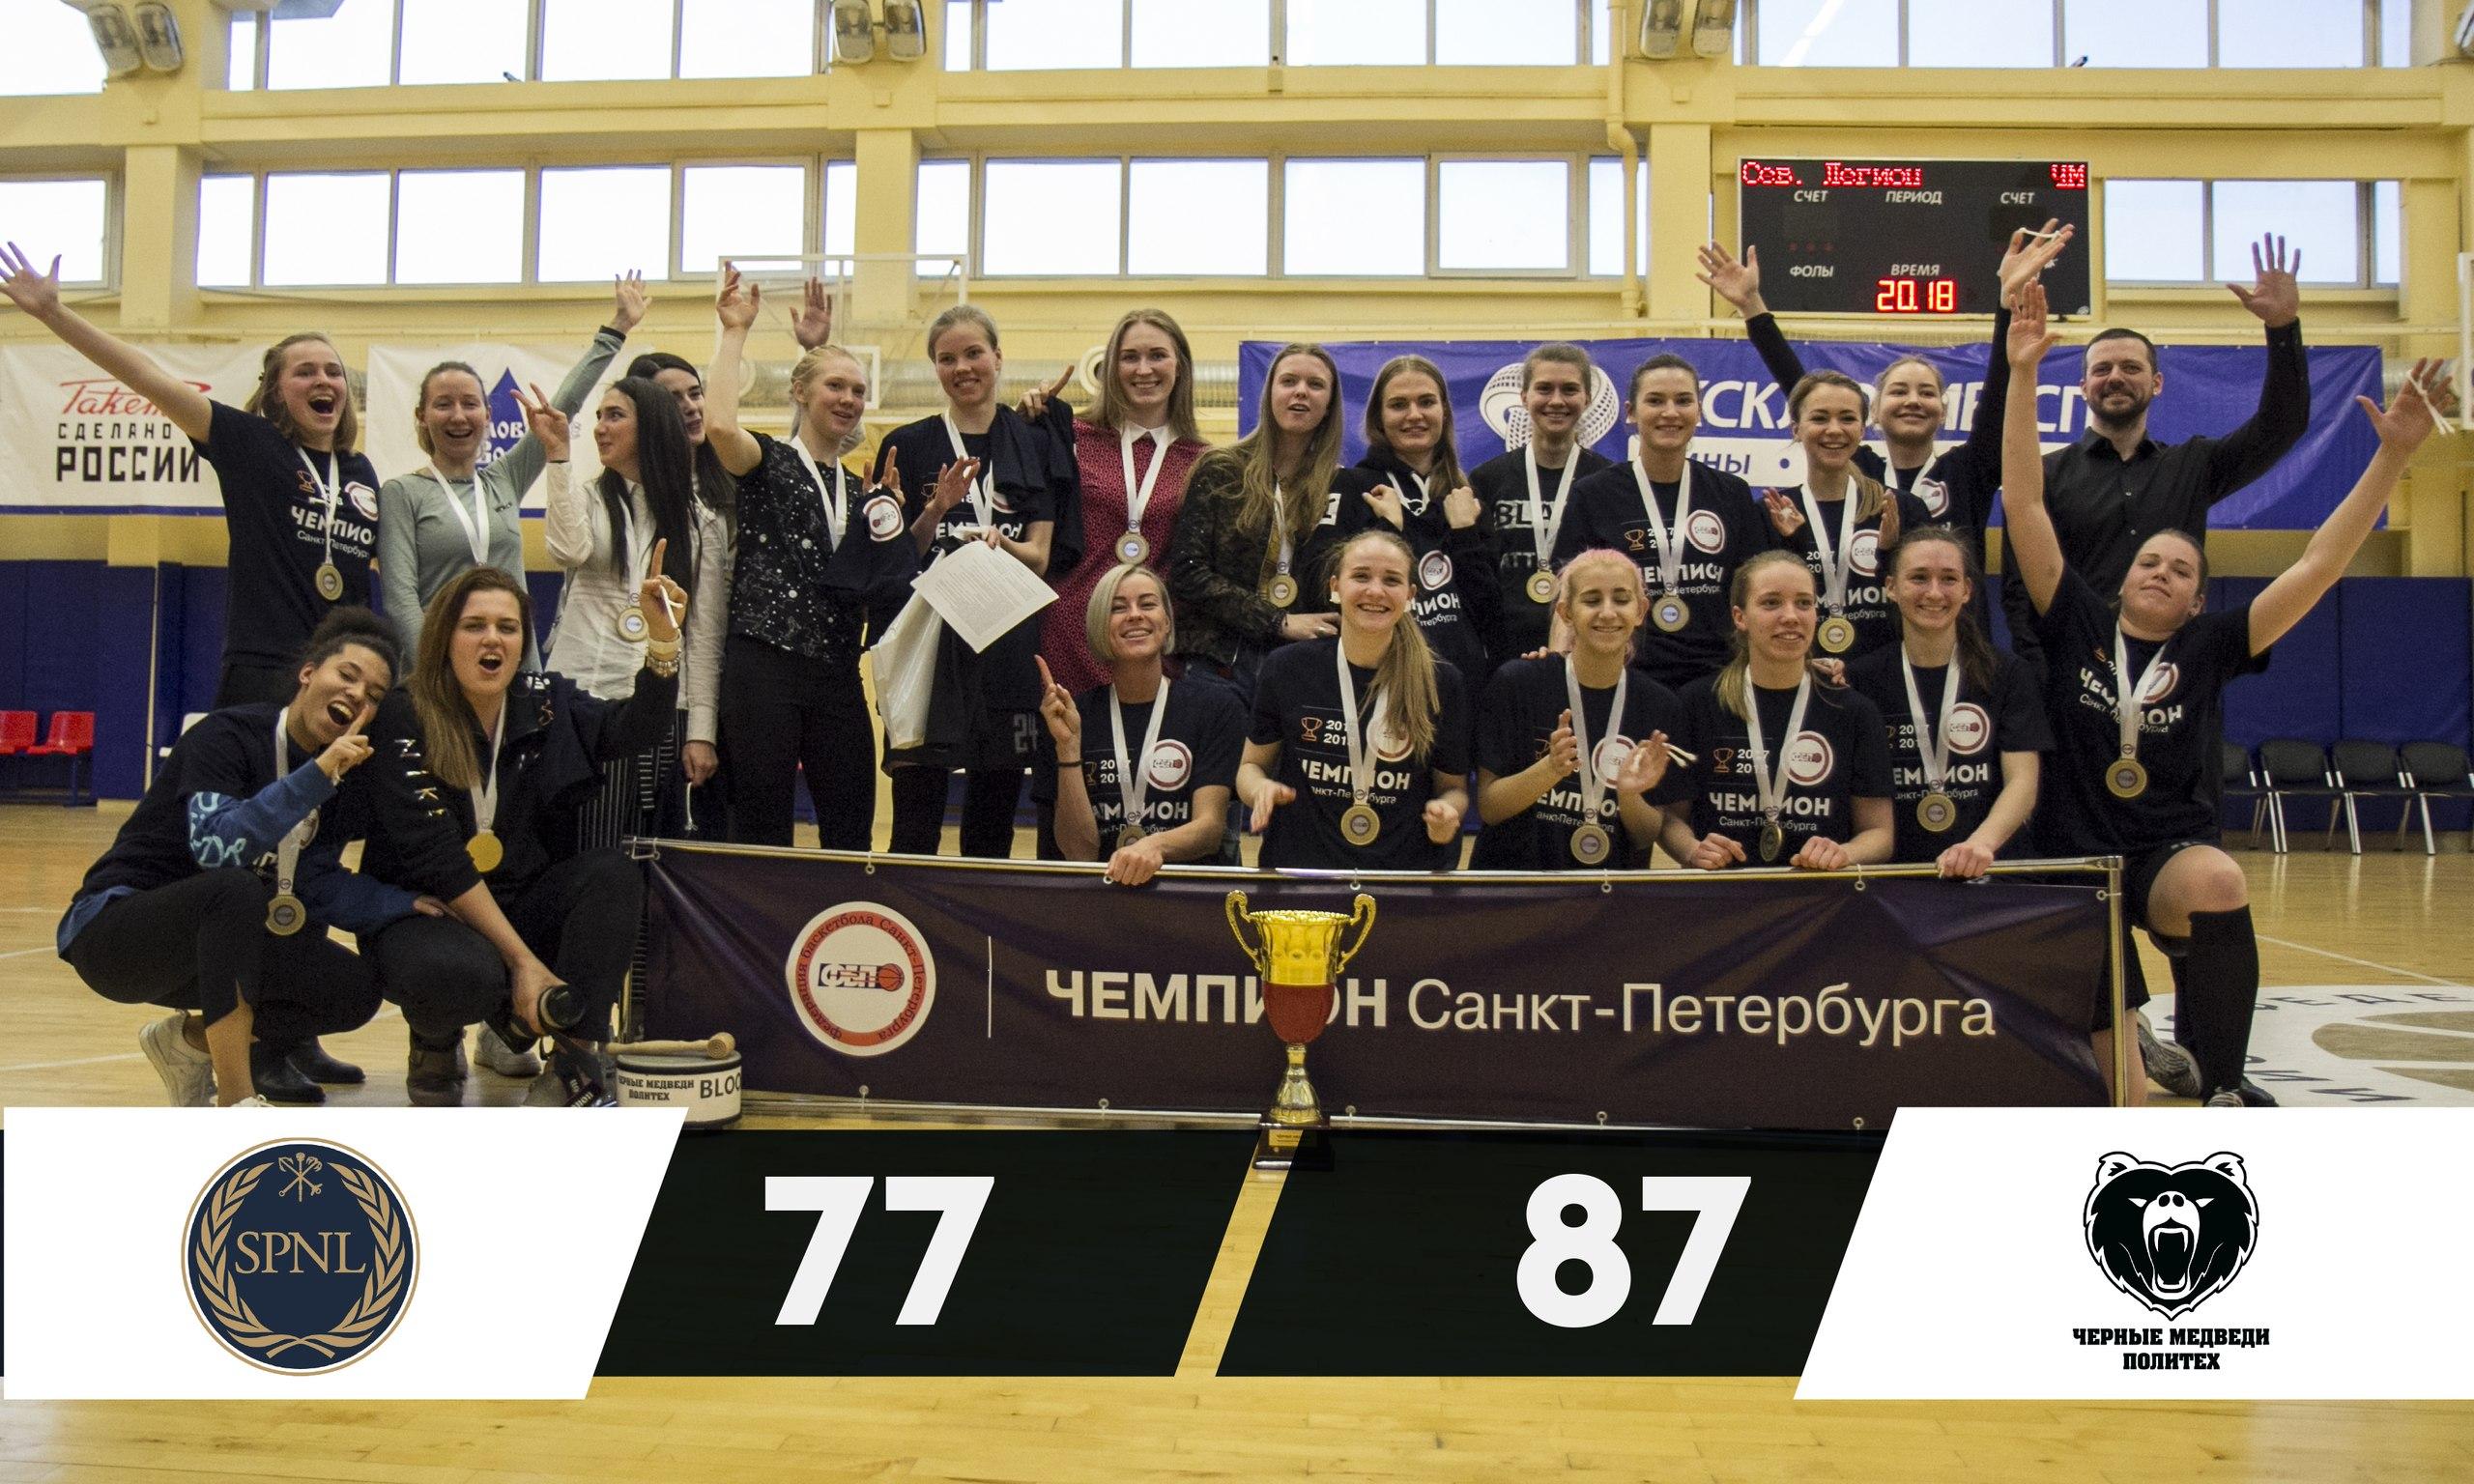 Чёрные медведи - Чемпион Санкт-Петербурга 2018